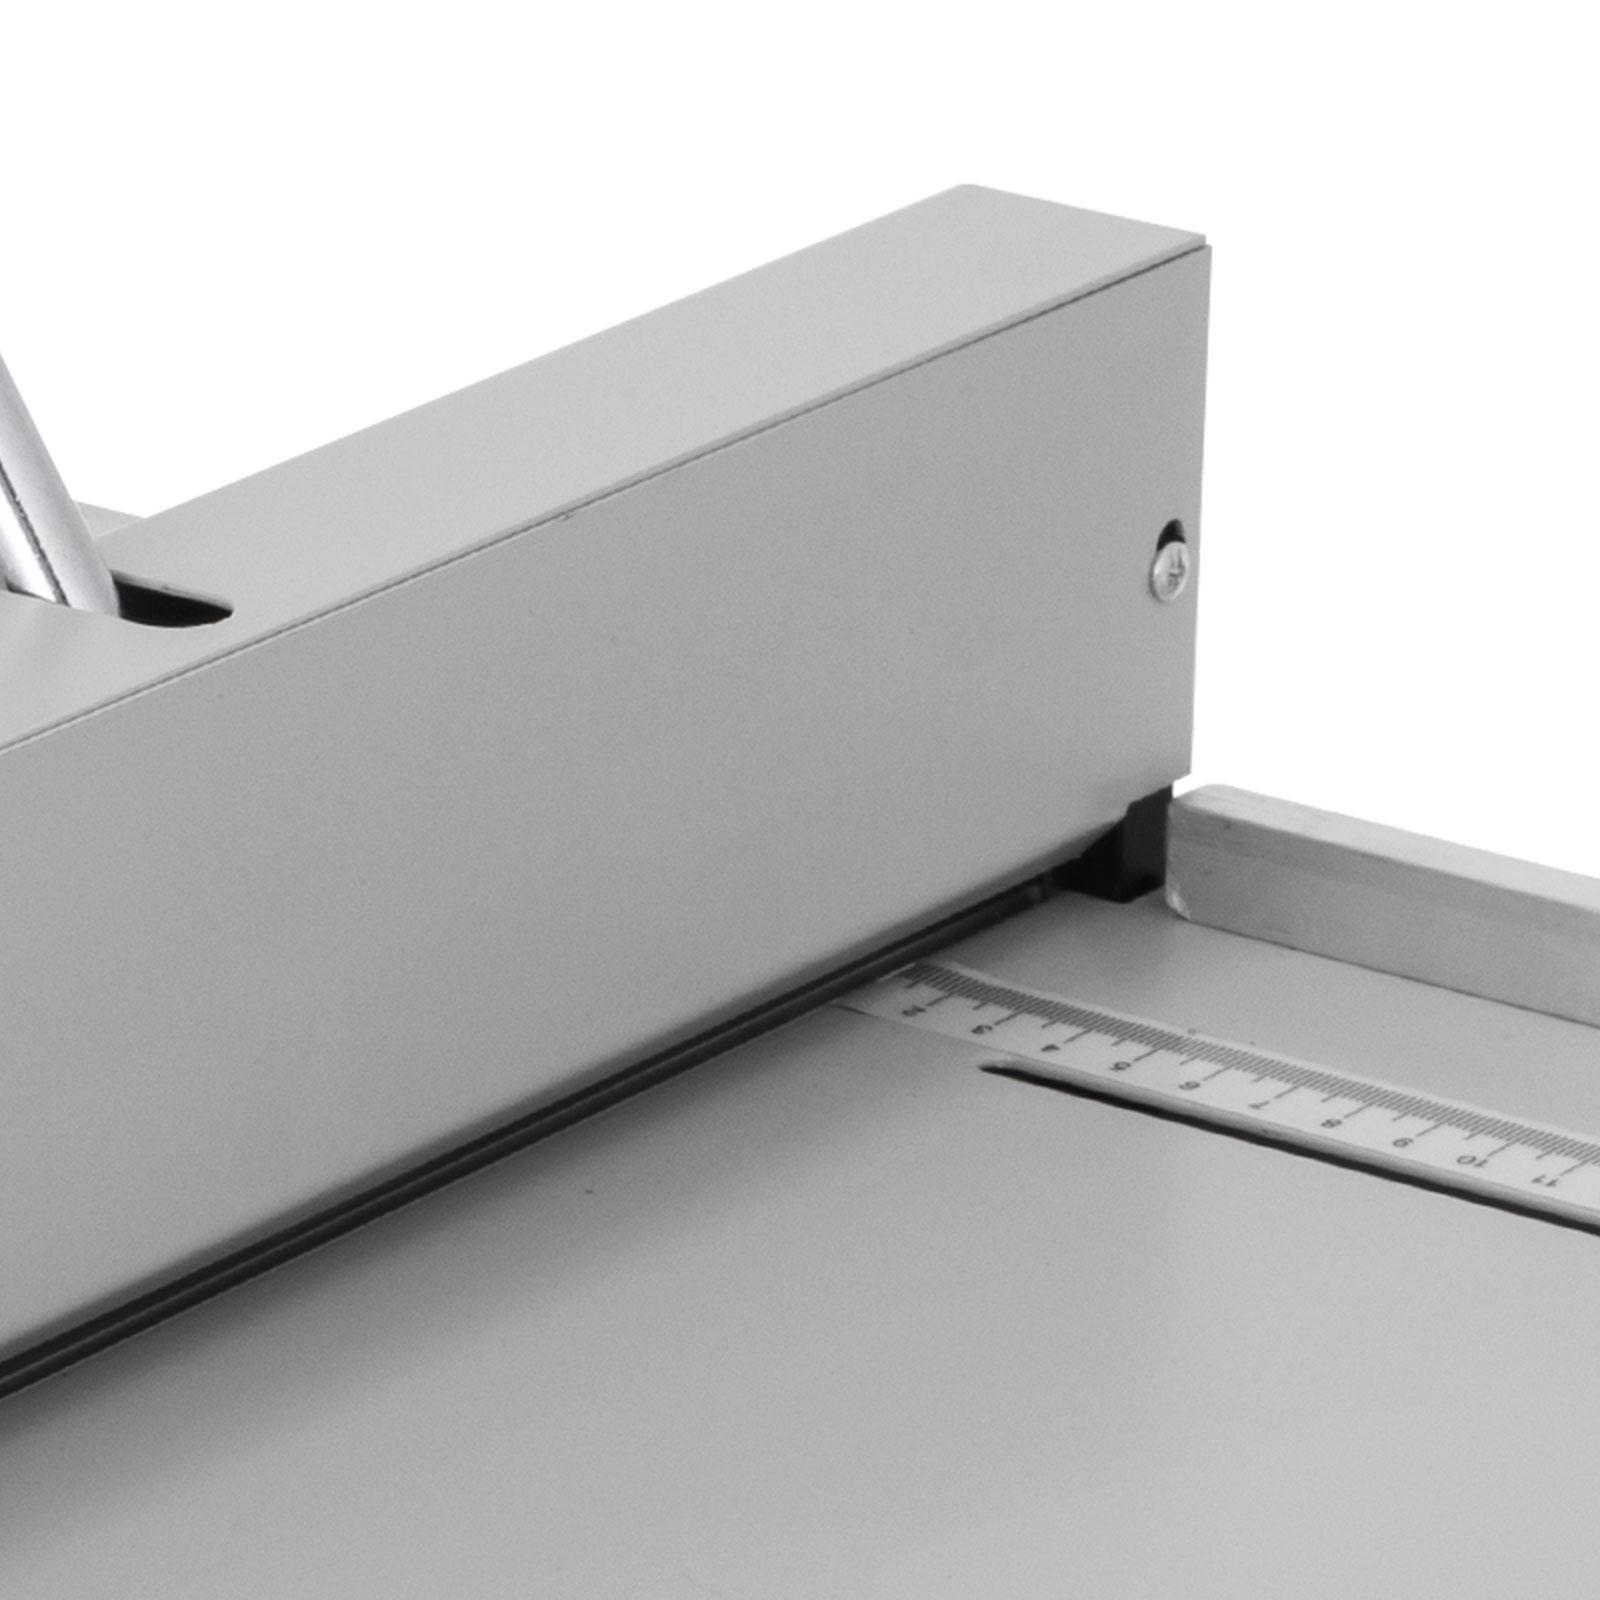 Cordonatrice-Perforatrice-Max-350-520mm-Profondita-Regolabile-Elettrica-Manuale miniatura 67